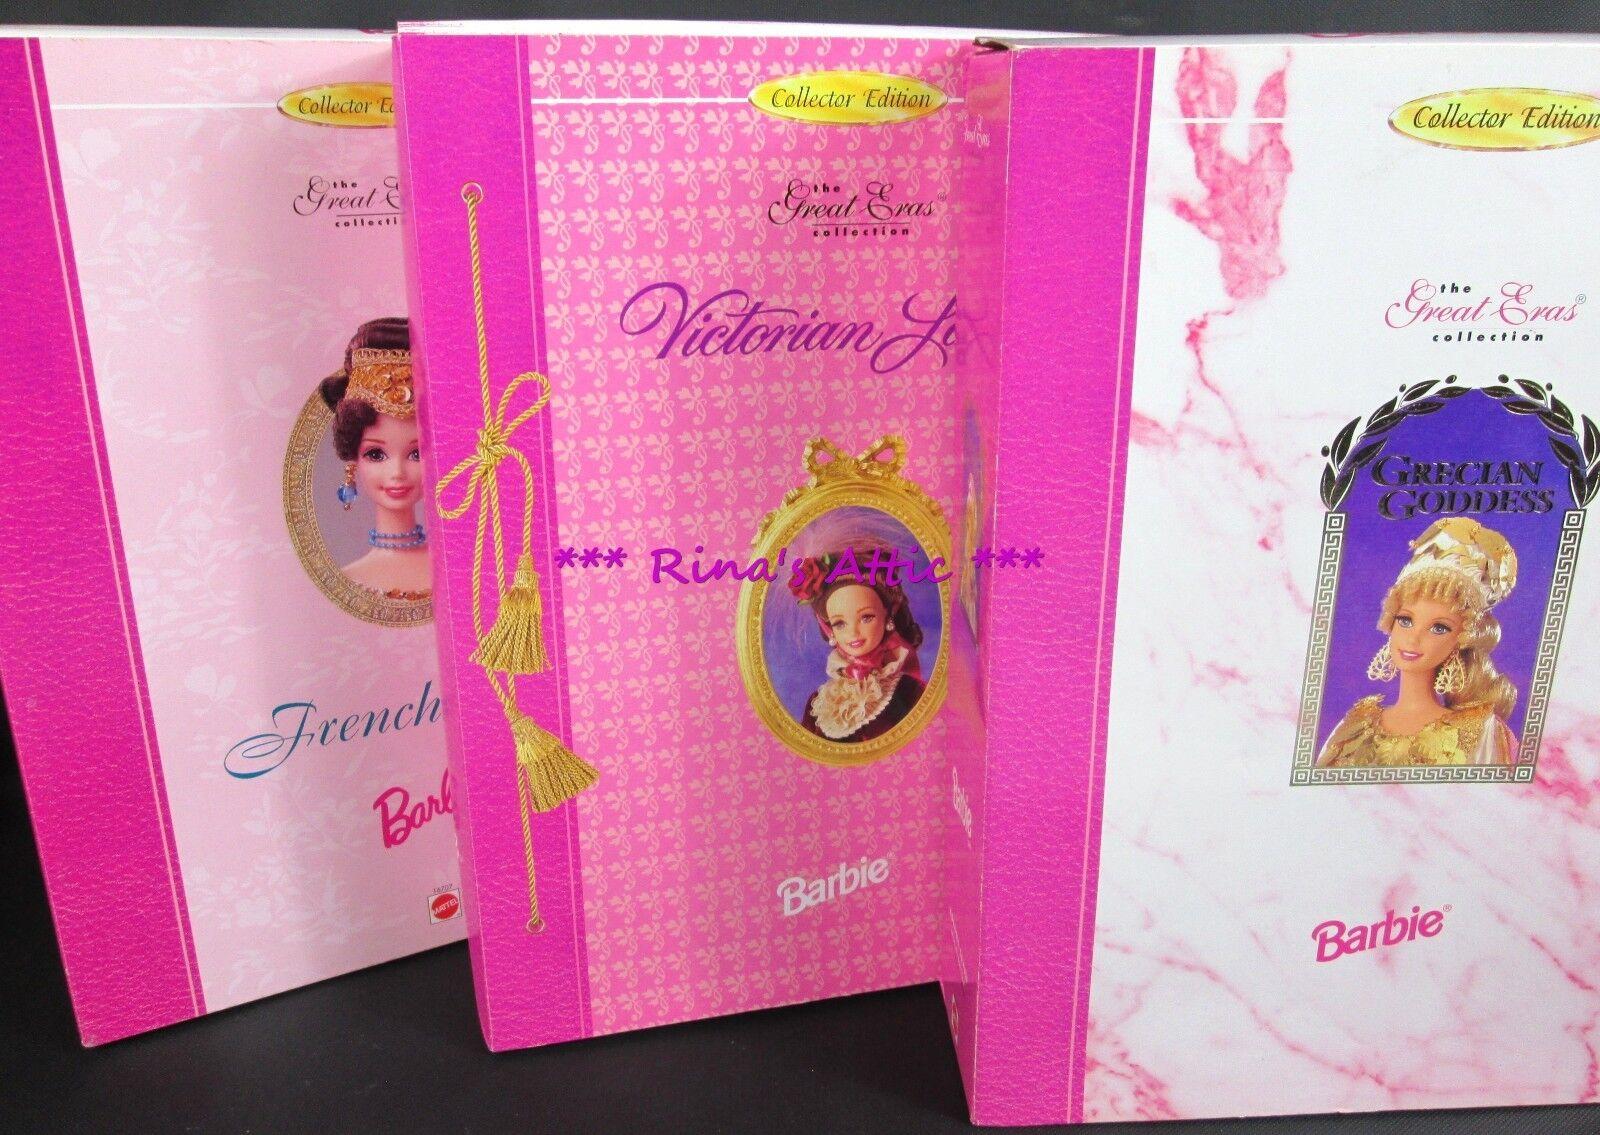 (Lote de 3) Excelente eras Muñecas Barbie Grecian Goddess francés victoriana Lady